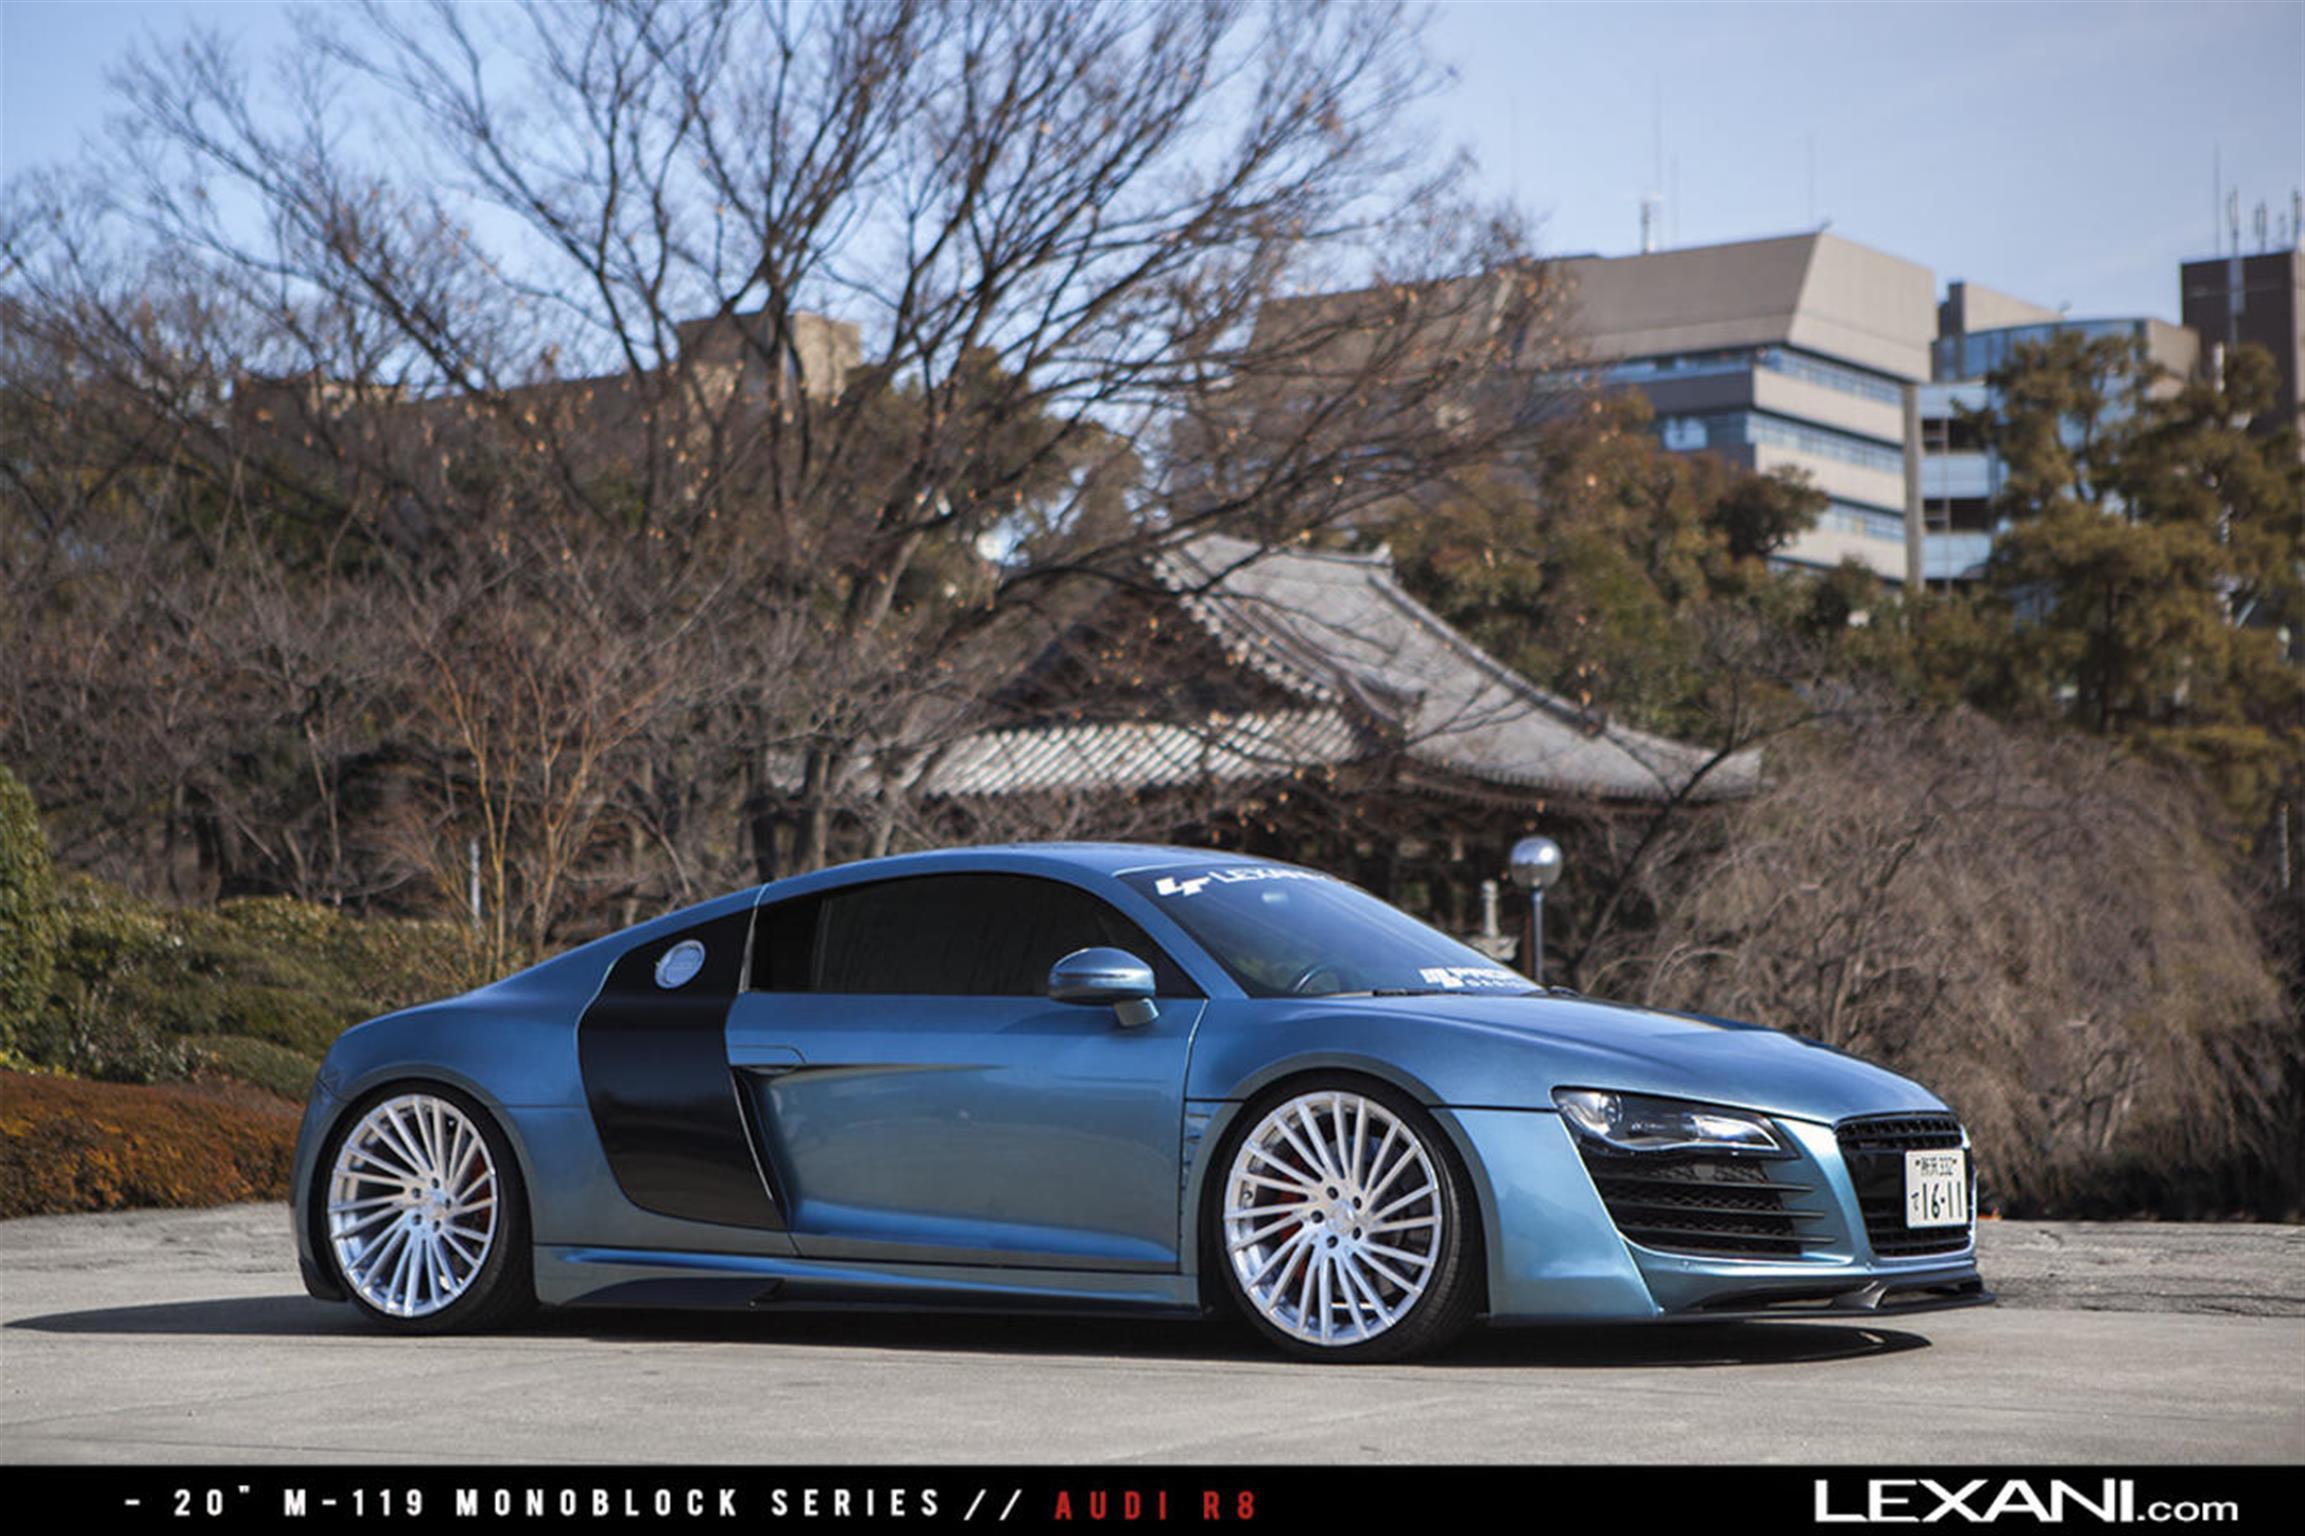 Audi - R8 -  - Wheels & Tires